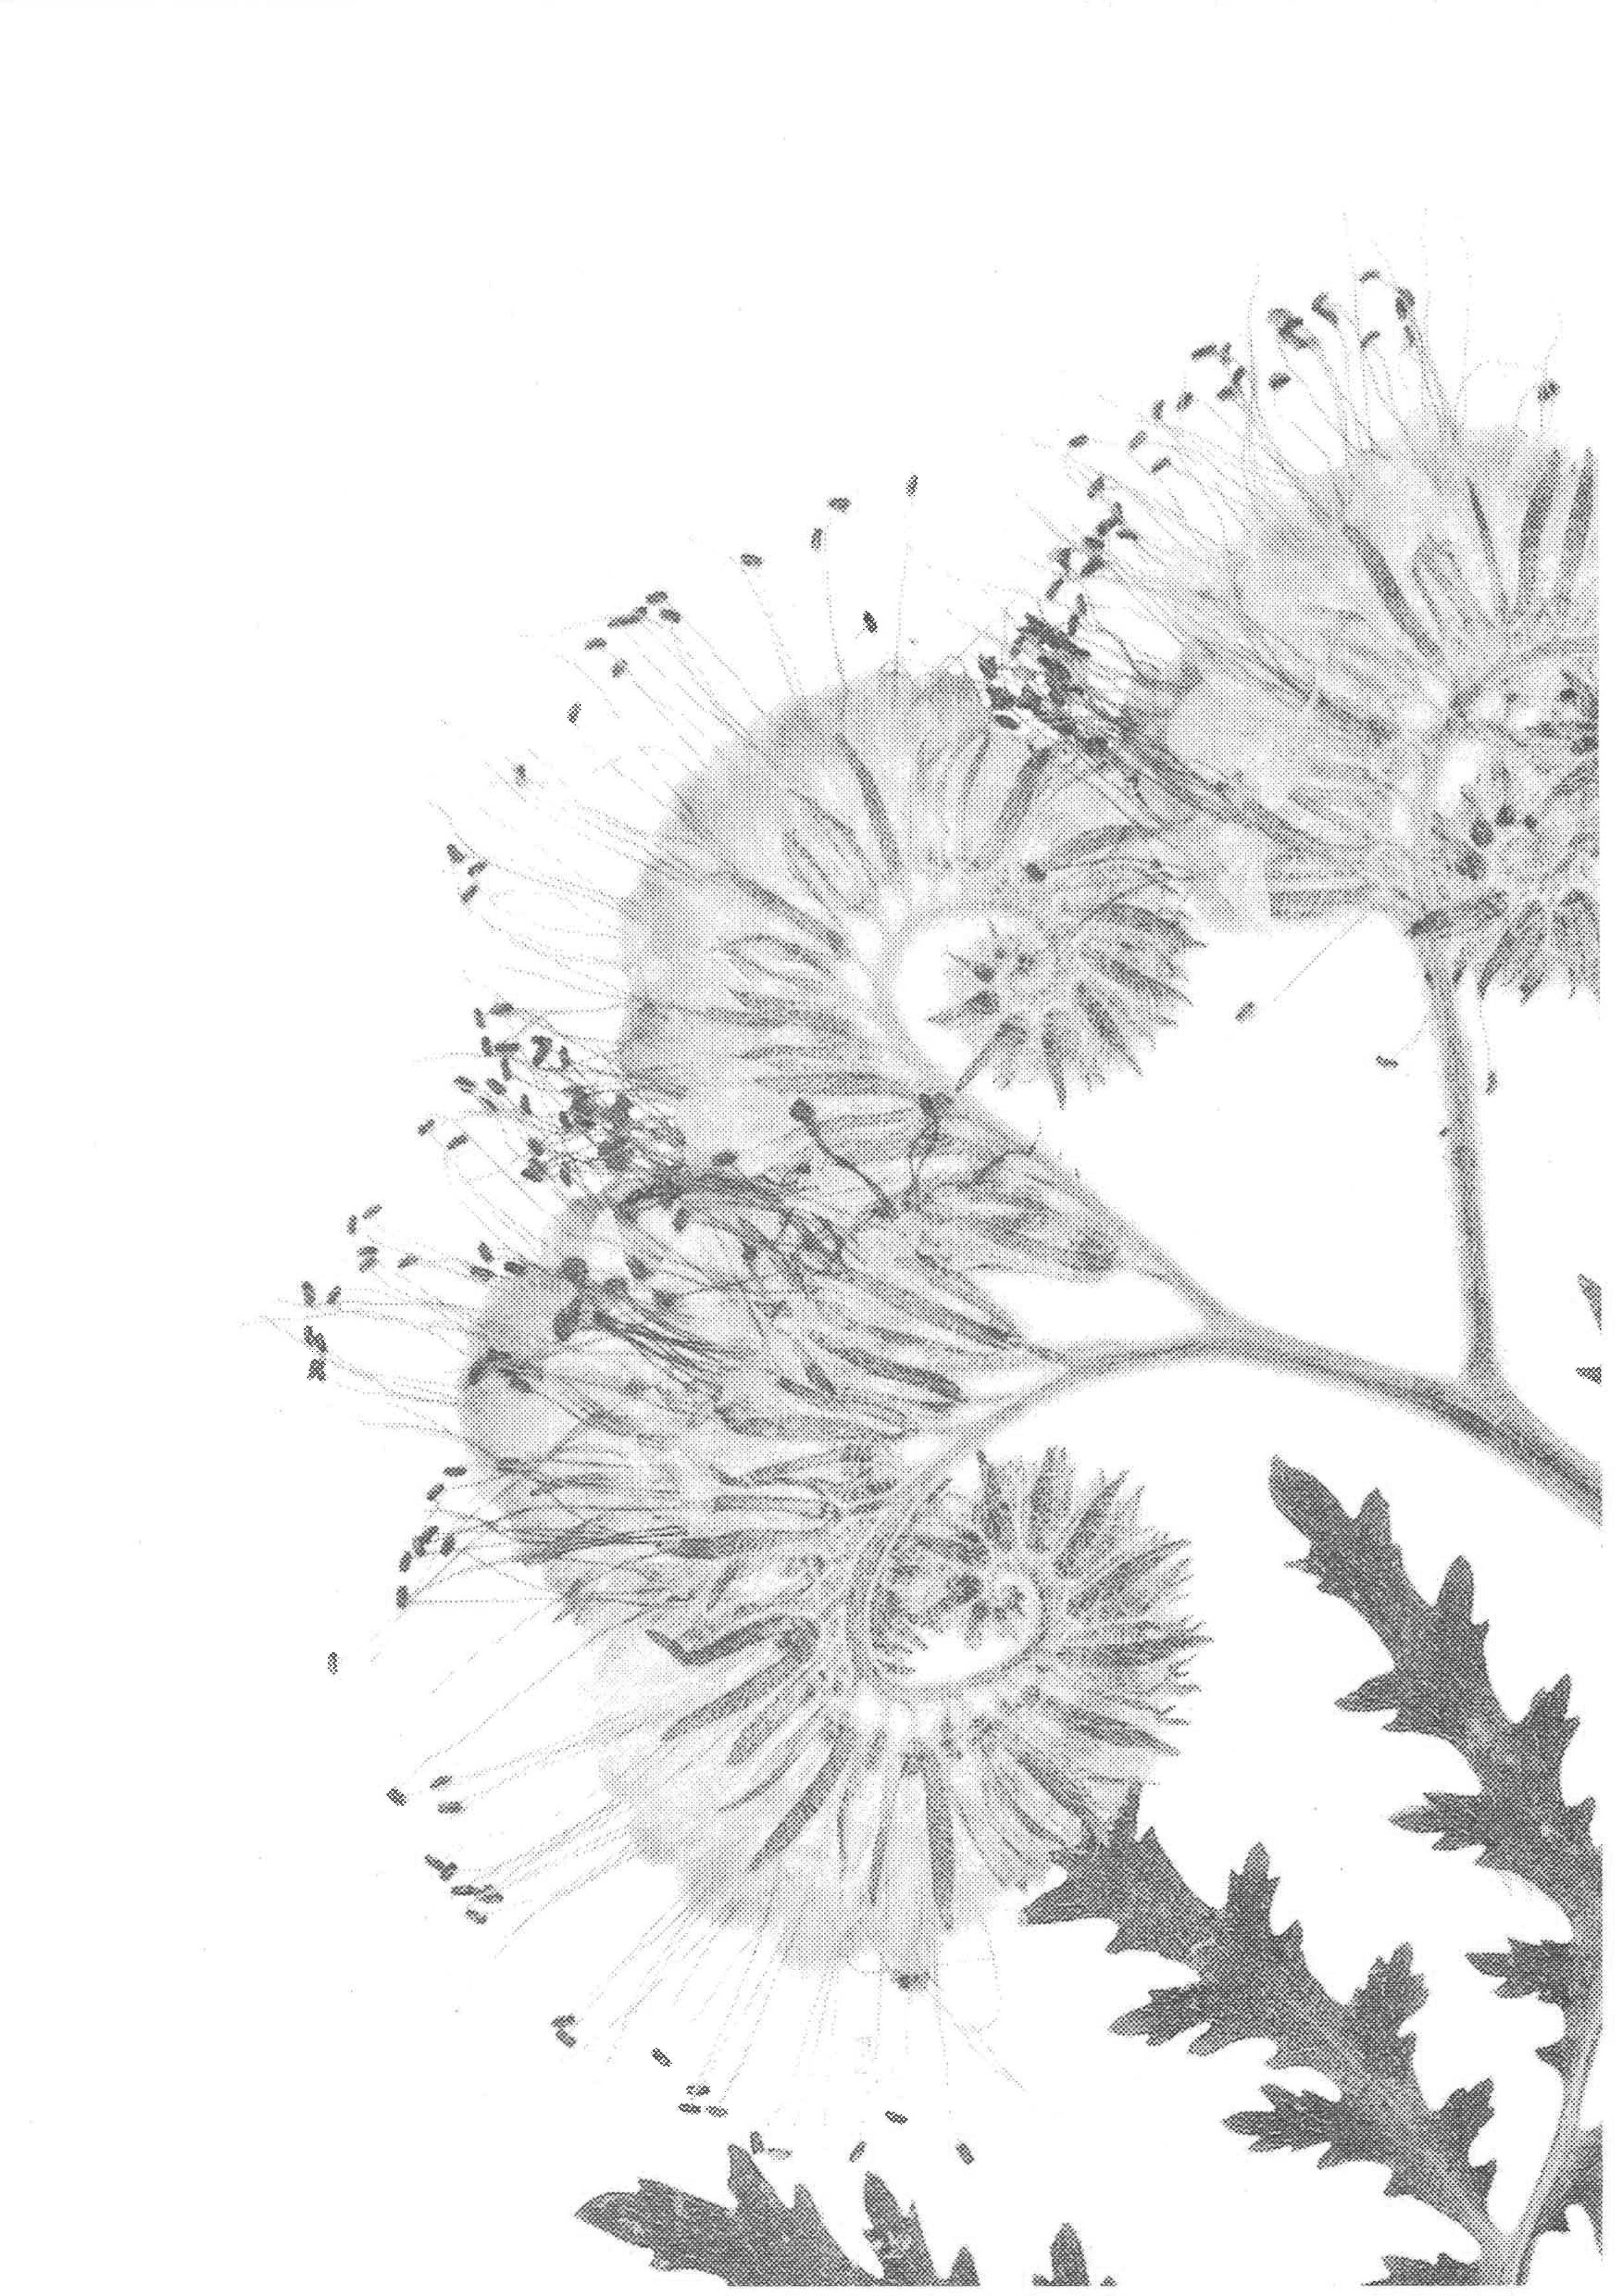 Flower-scan_bw8.jpg